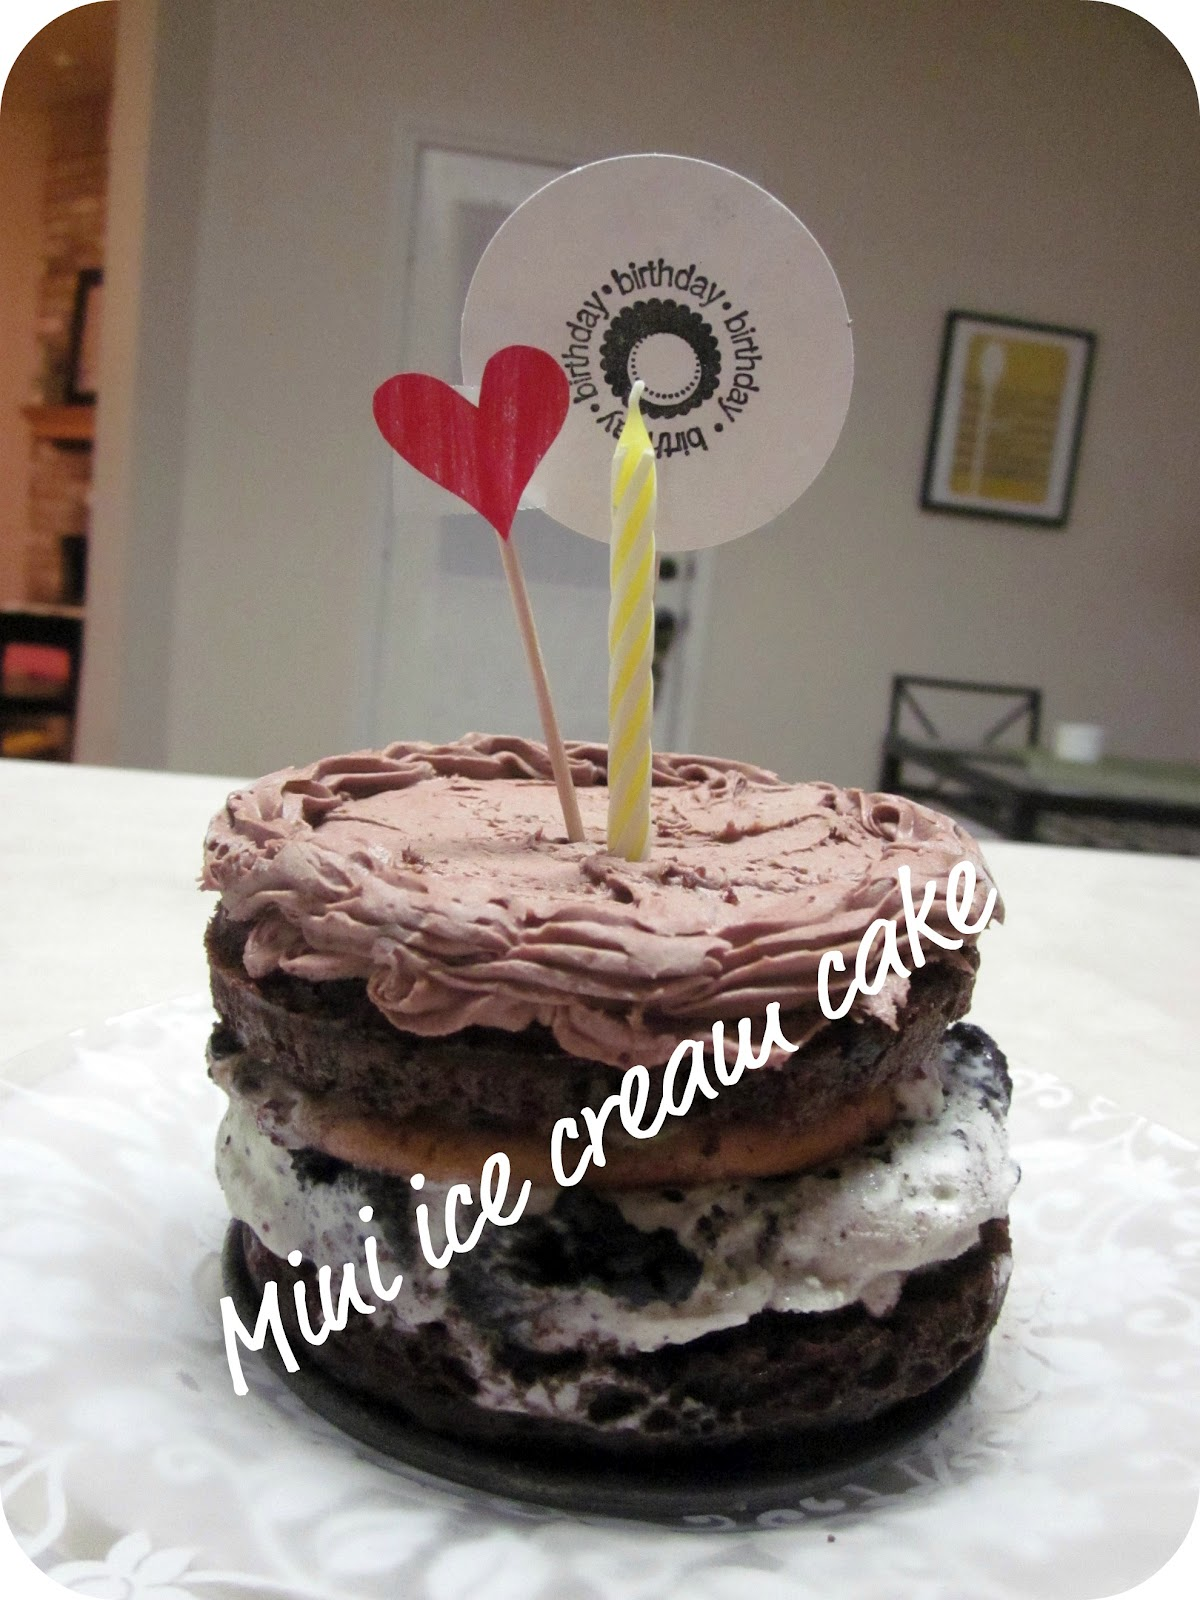 Springform Pan Vs Cake Pan